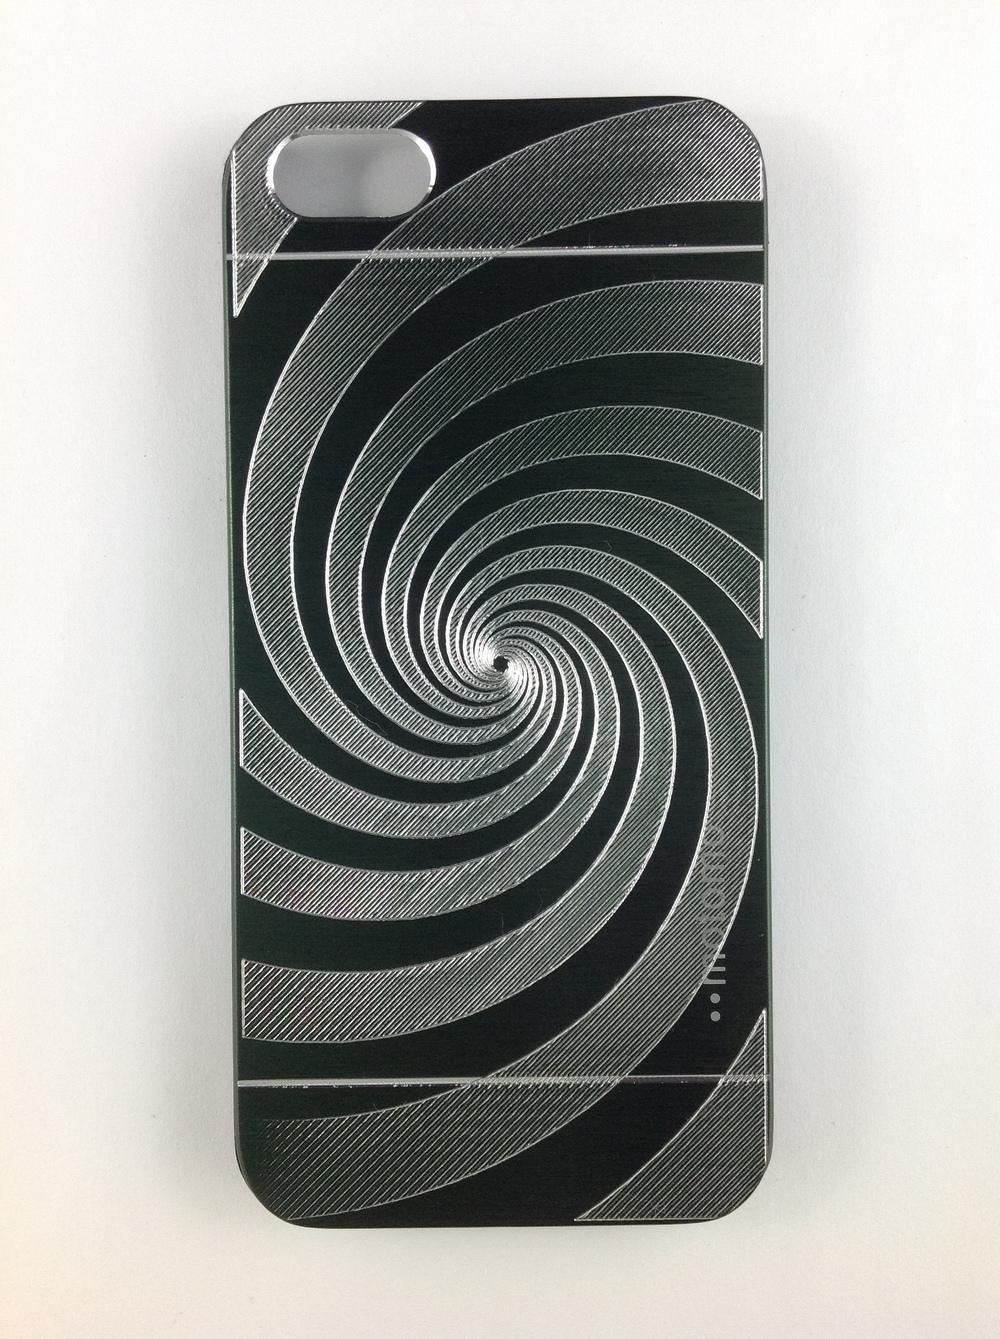 DigitalCarver-iPhone5s-IMG_3695.JPG